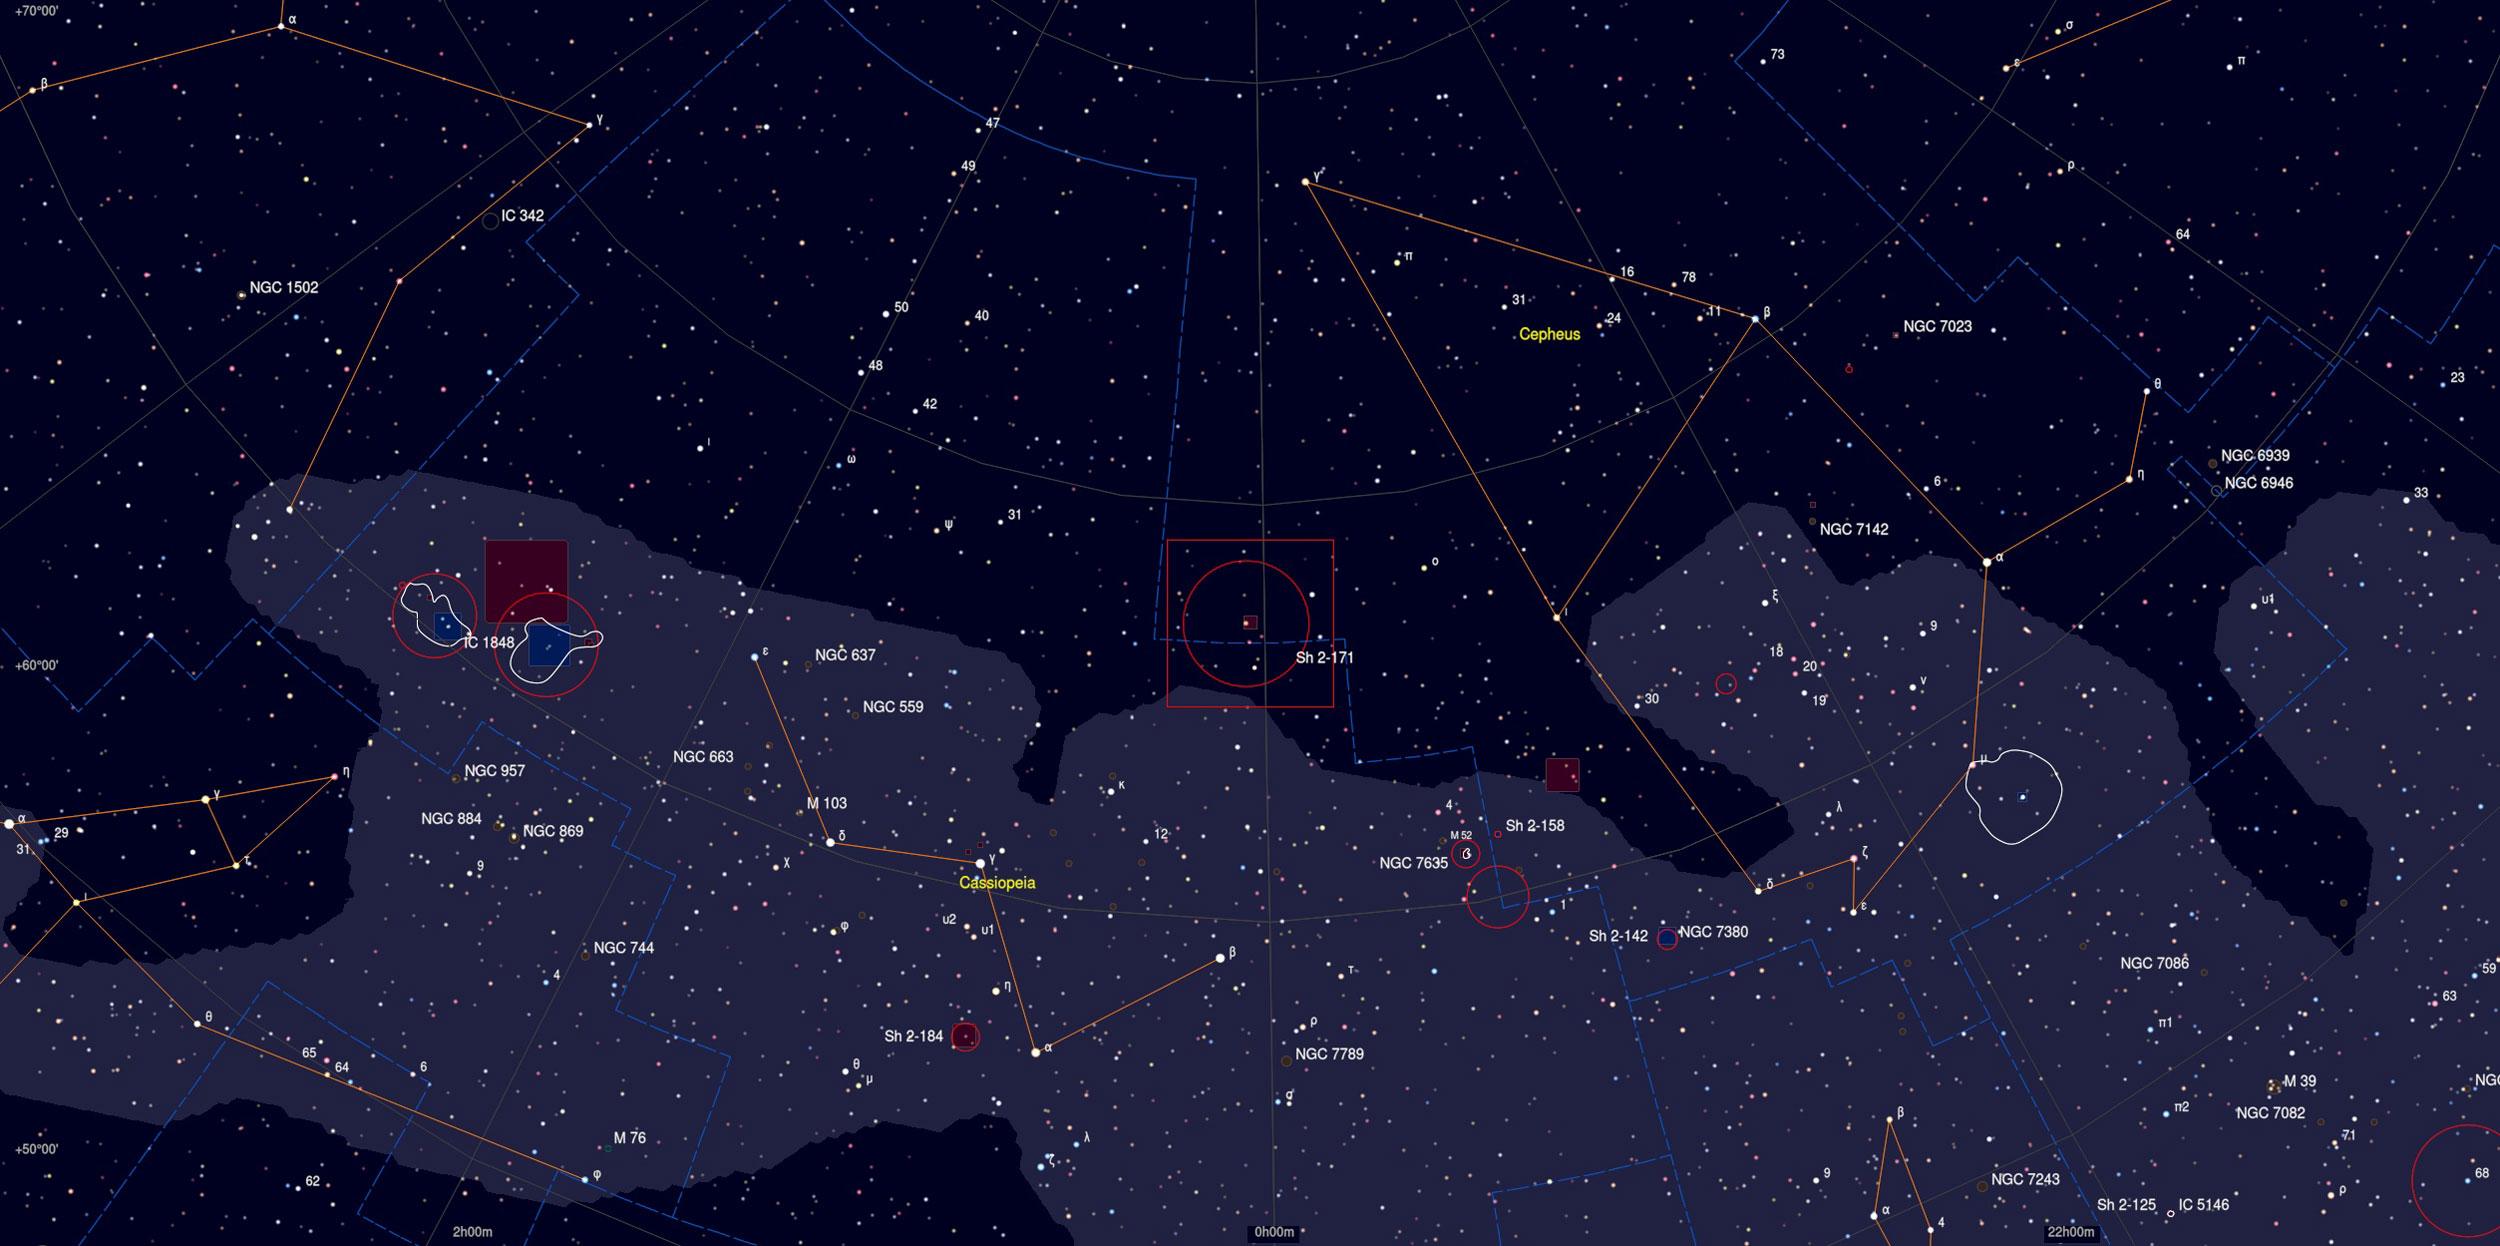 NGC 7822 Nebula Sky Chart - Astrophotography Martin Rusterholz